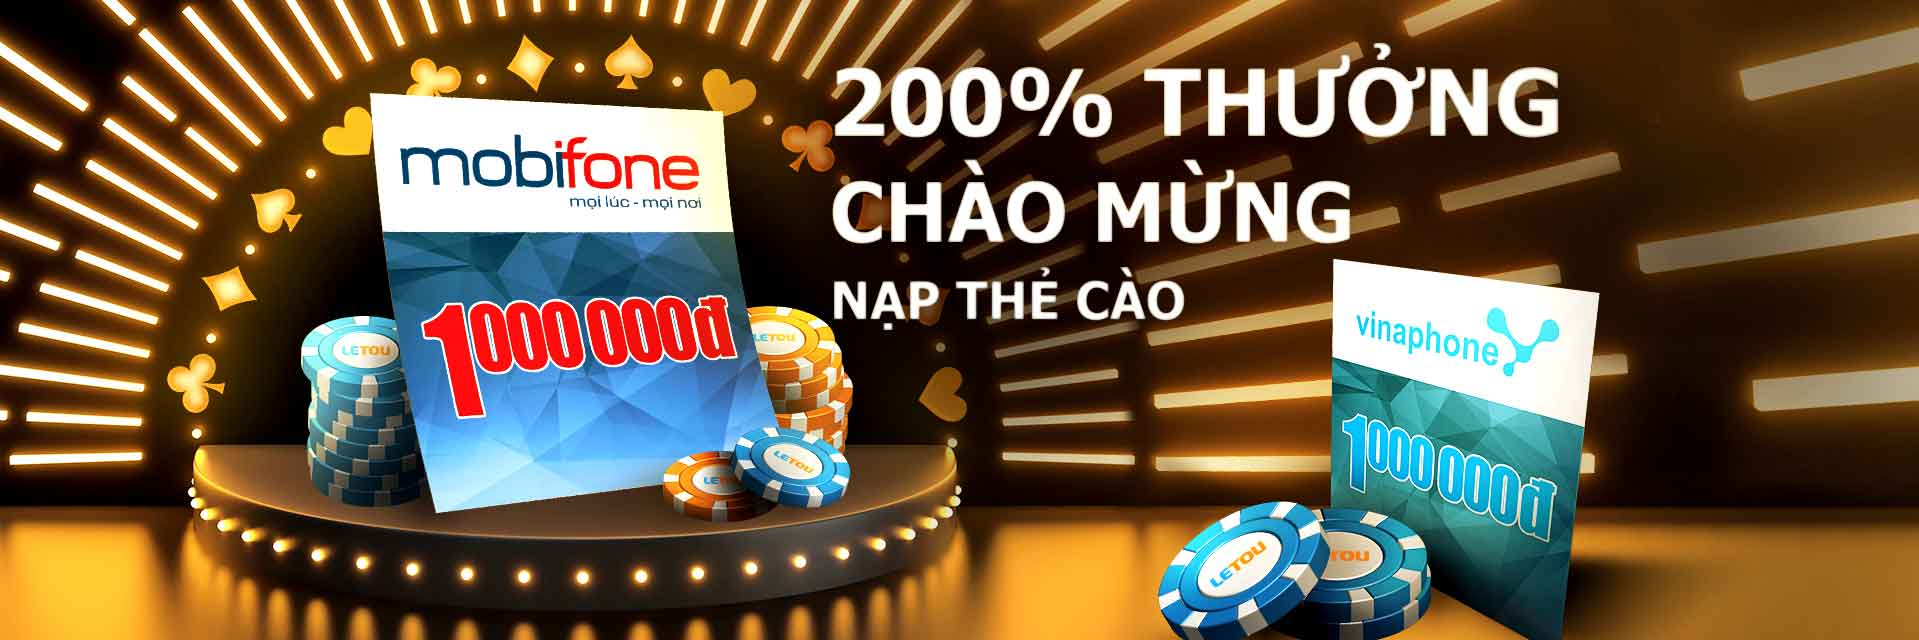 Nha-cai-Letou-tang-200%-nap-the-cao